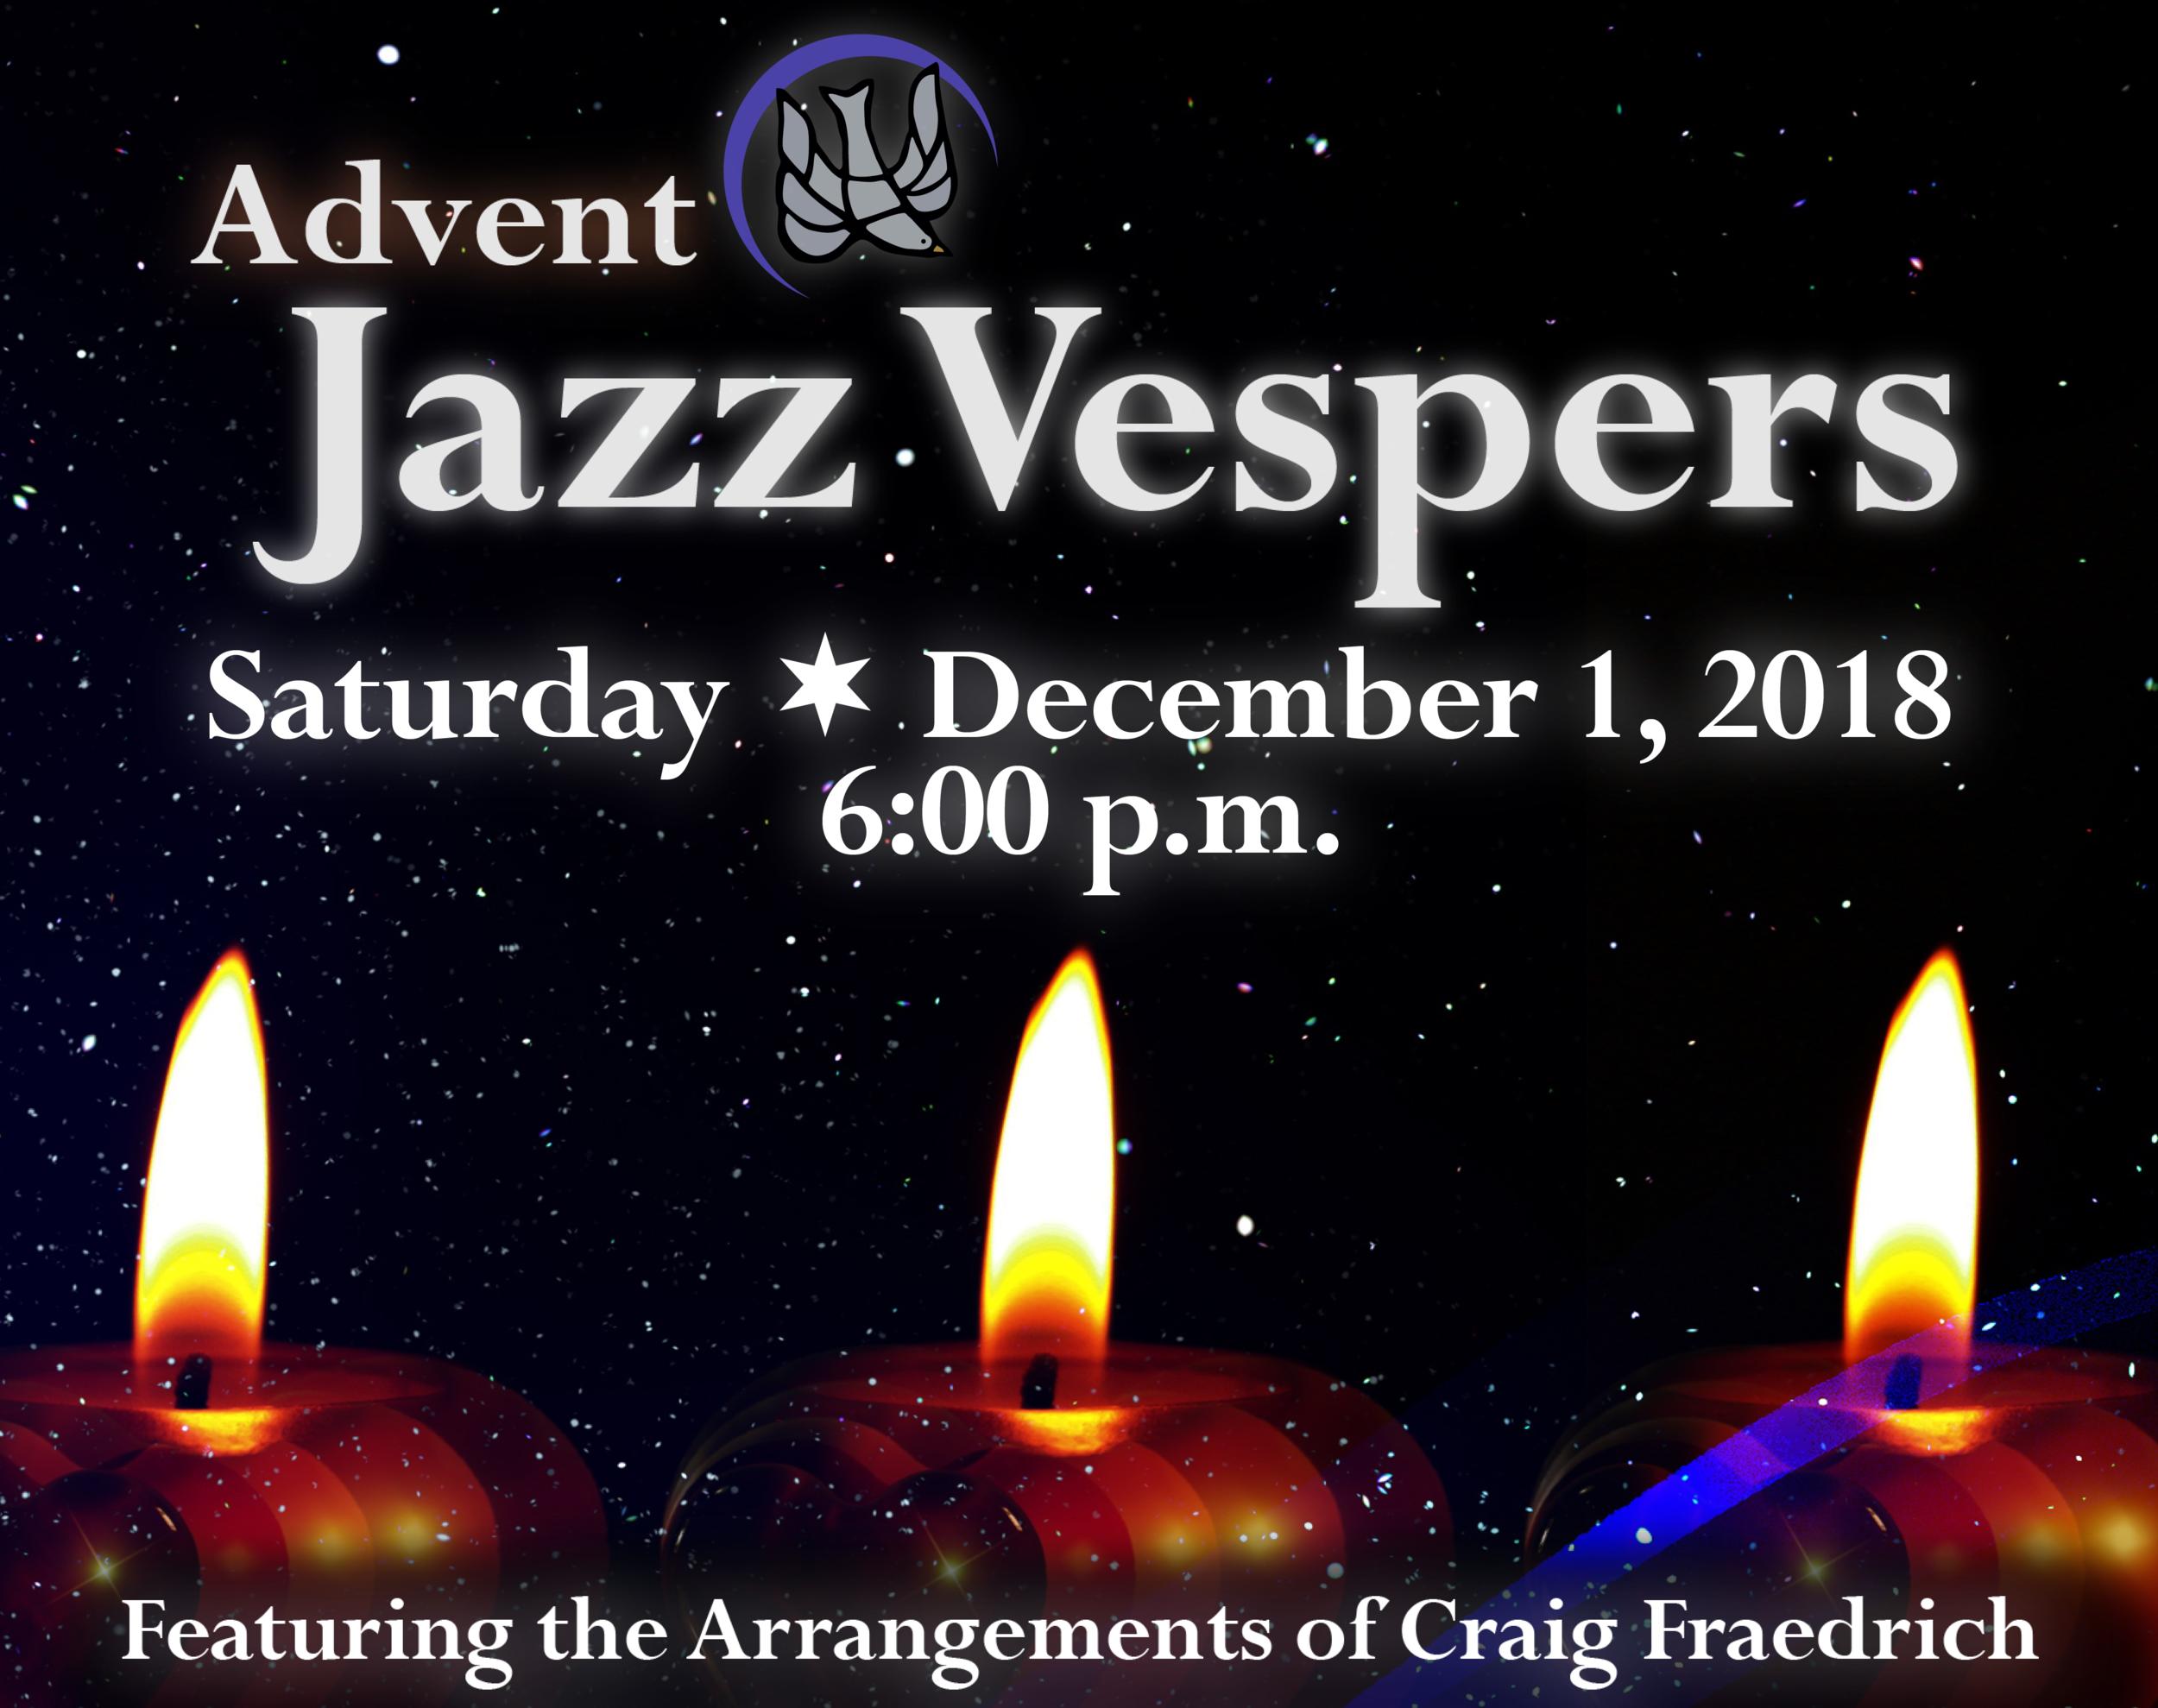 Advent Jazz Vespers 2019 promo portrait v2.png